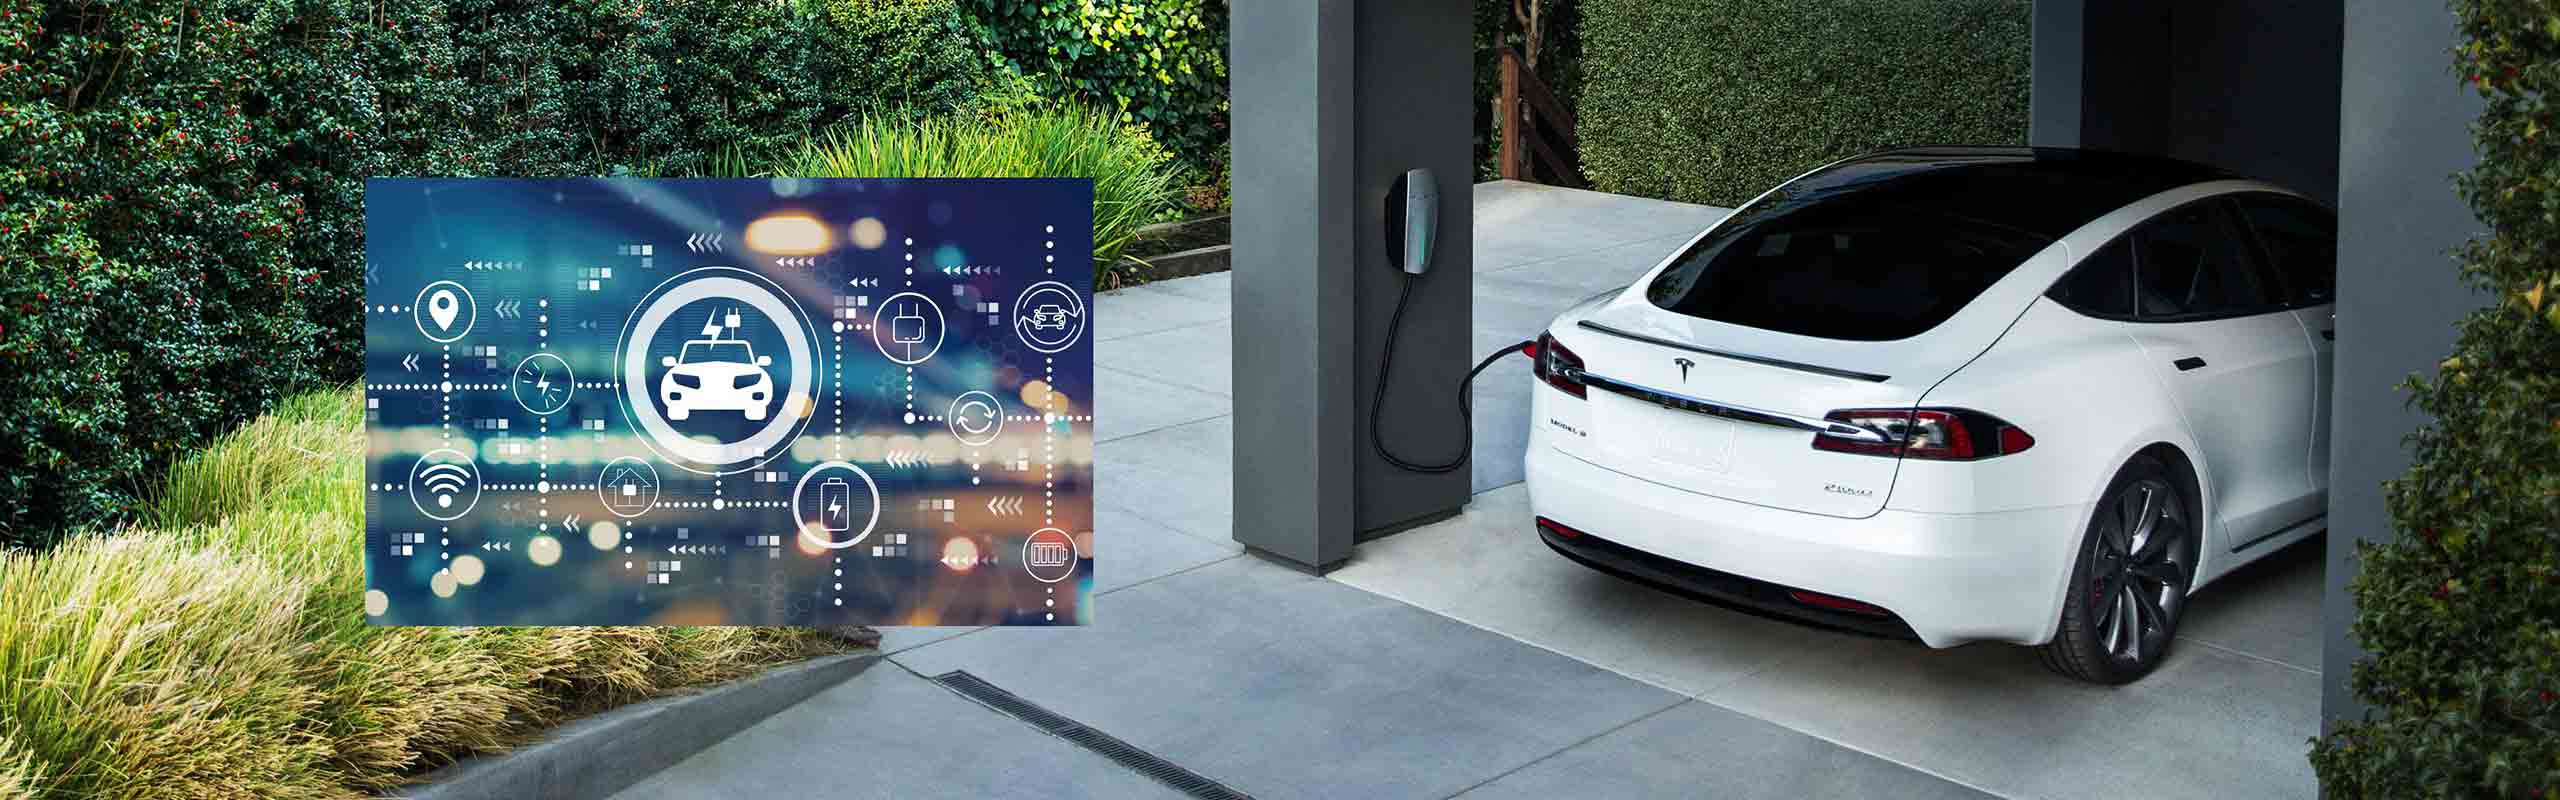 Electric Vehicle (EV) Charging Cornwall